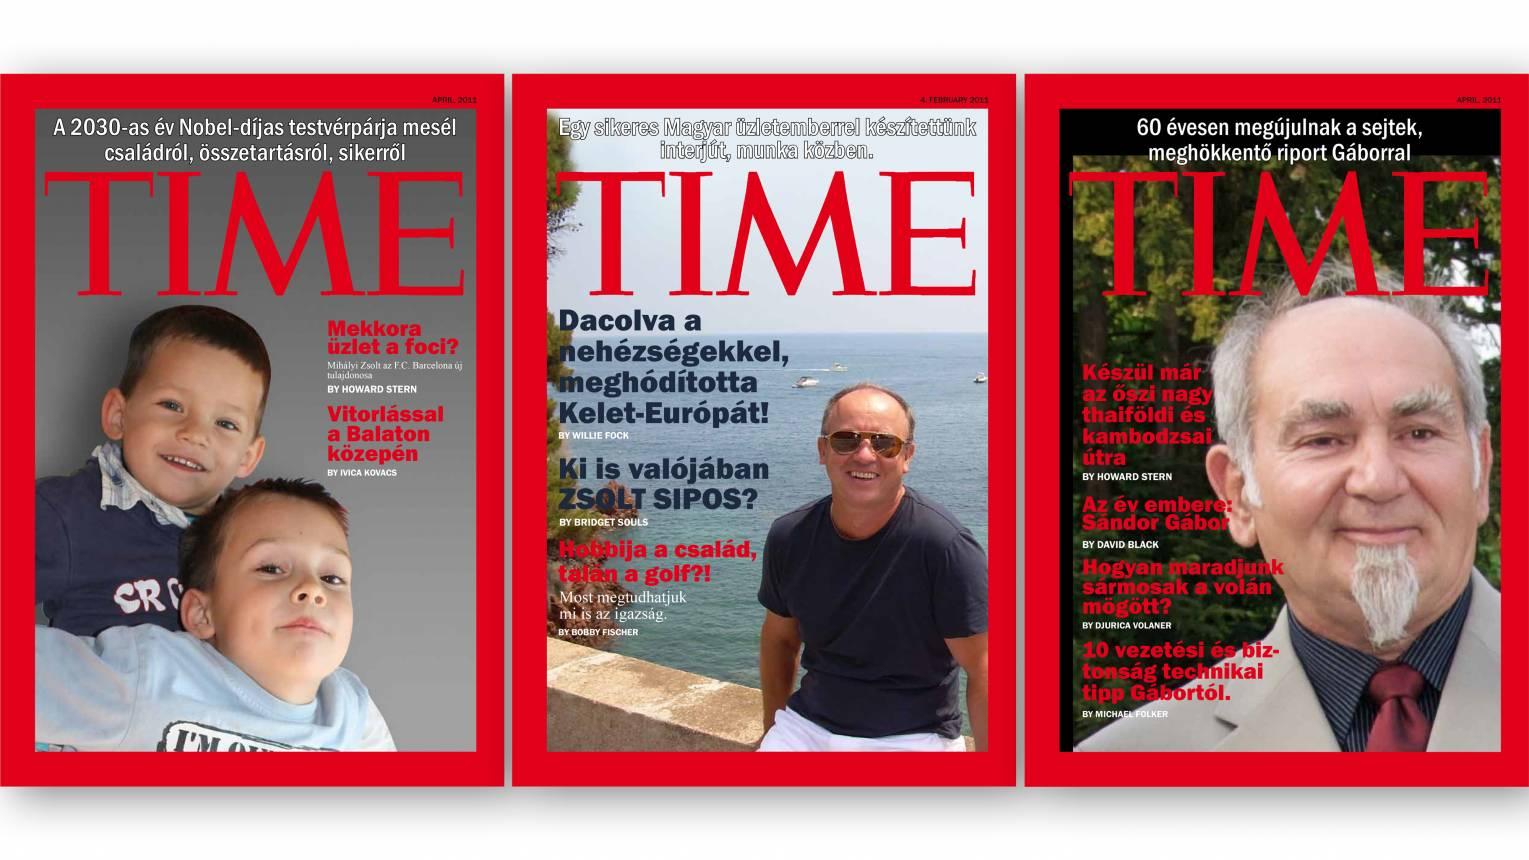 Barátod, párod a TIME címlapján